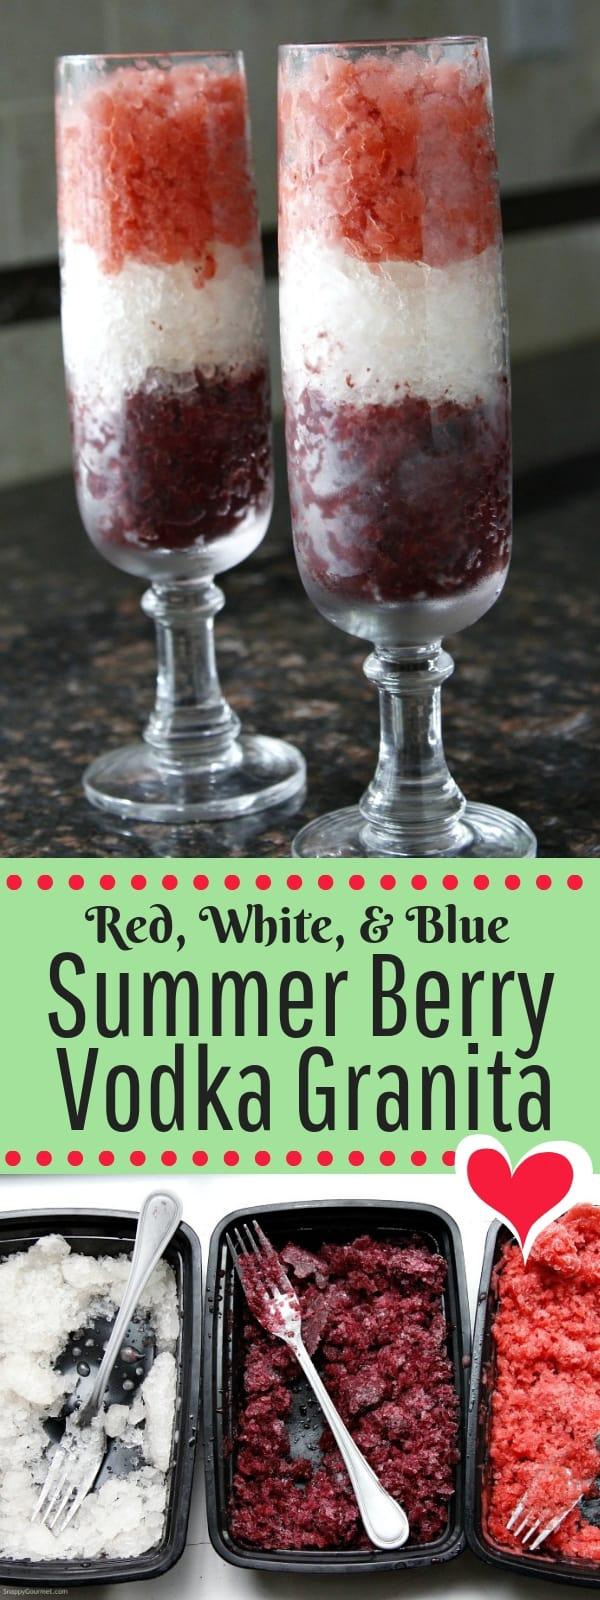 Vodka Granita photo collage